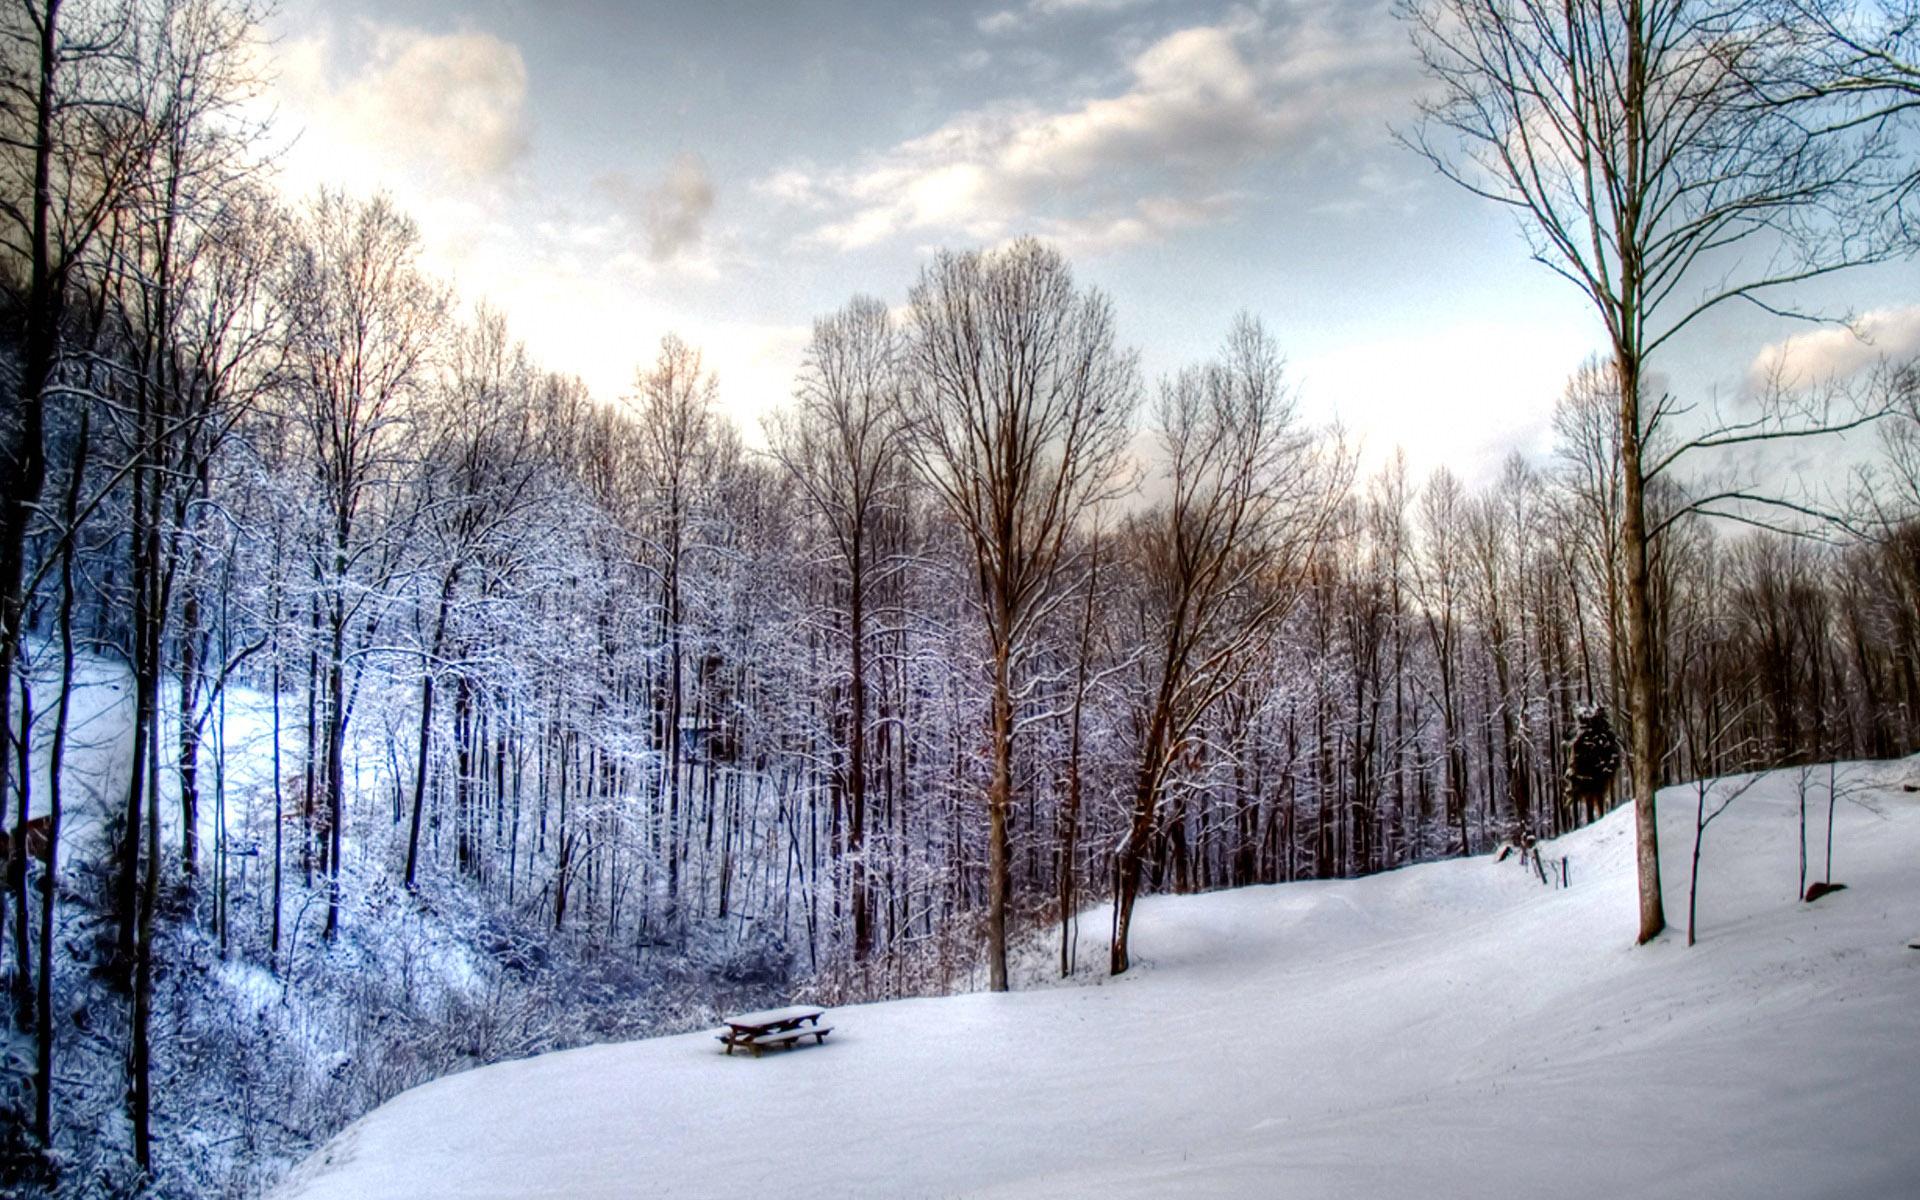 19201200 Widescreen Winter Snow Scenes   Dreamy Winter Snow Wallpaper 1920x1200